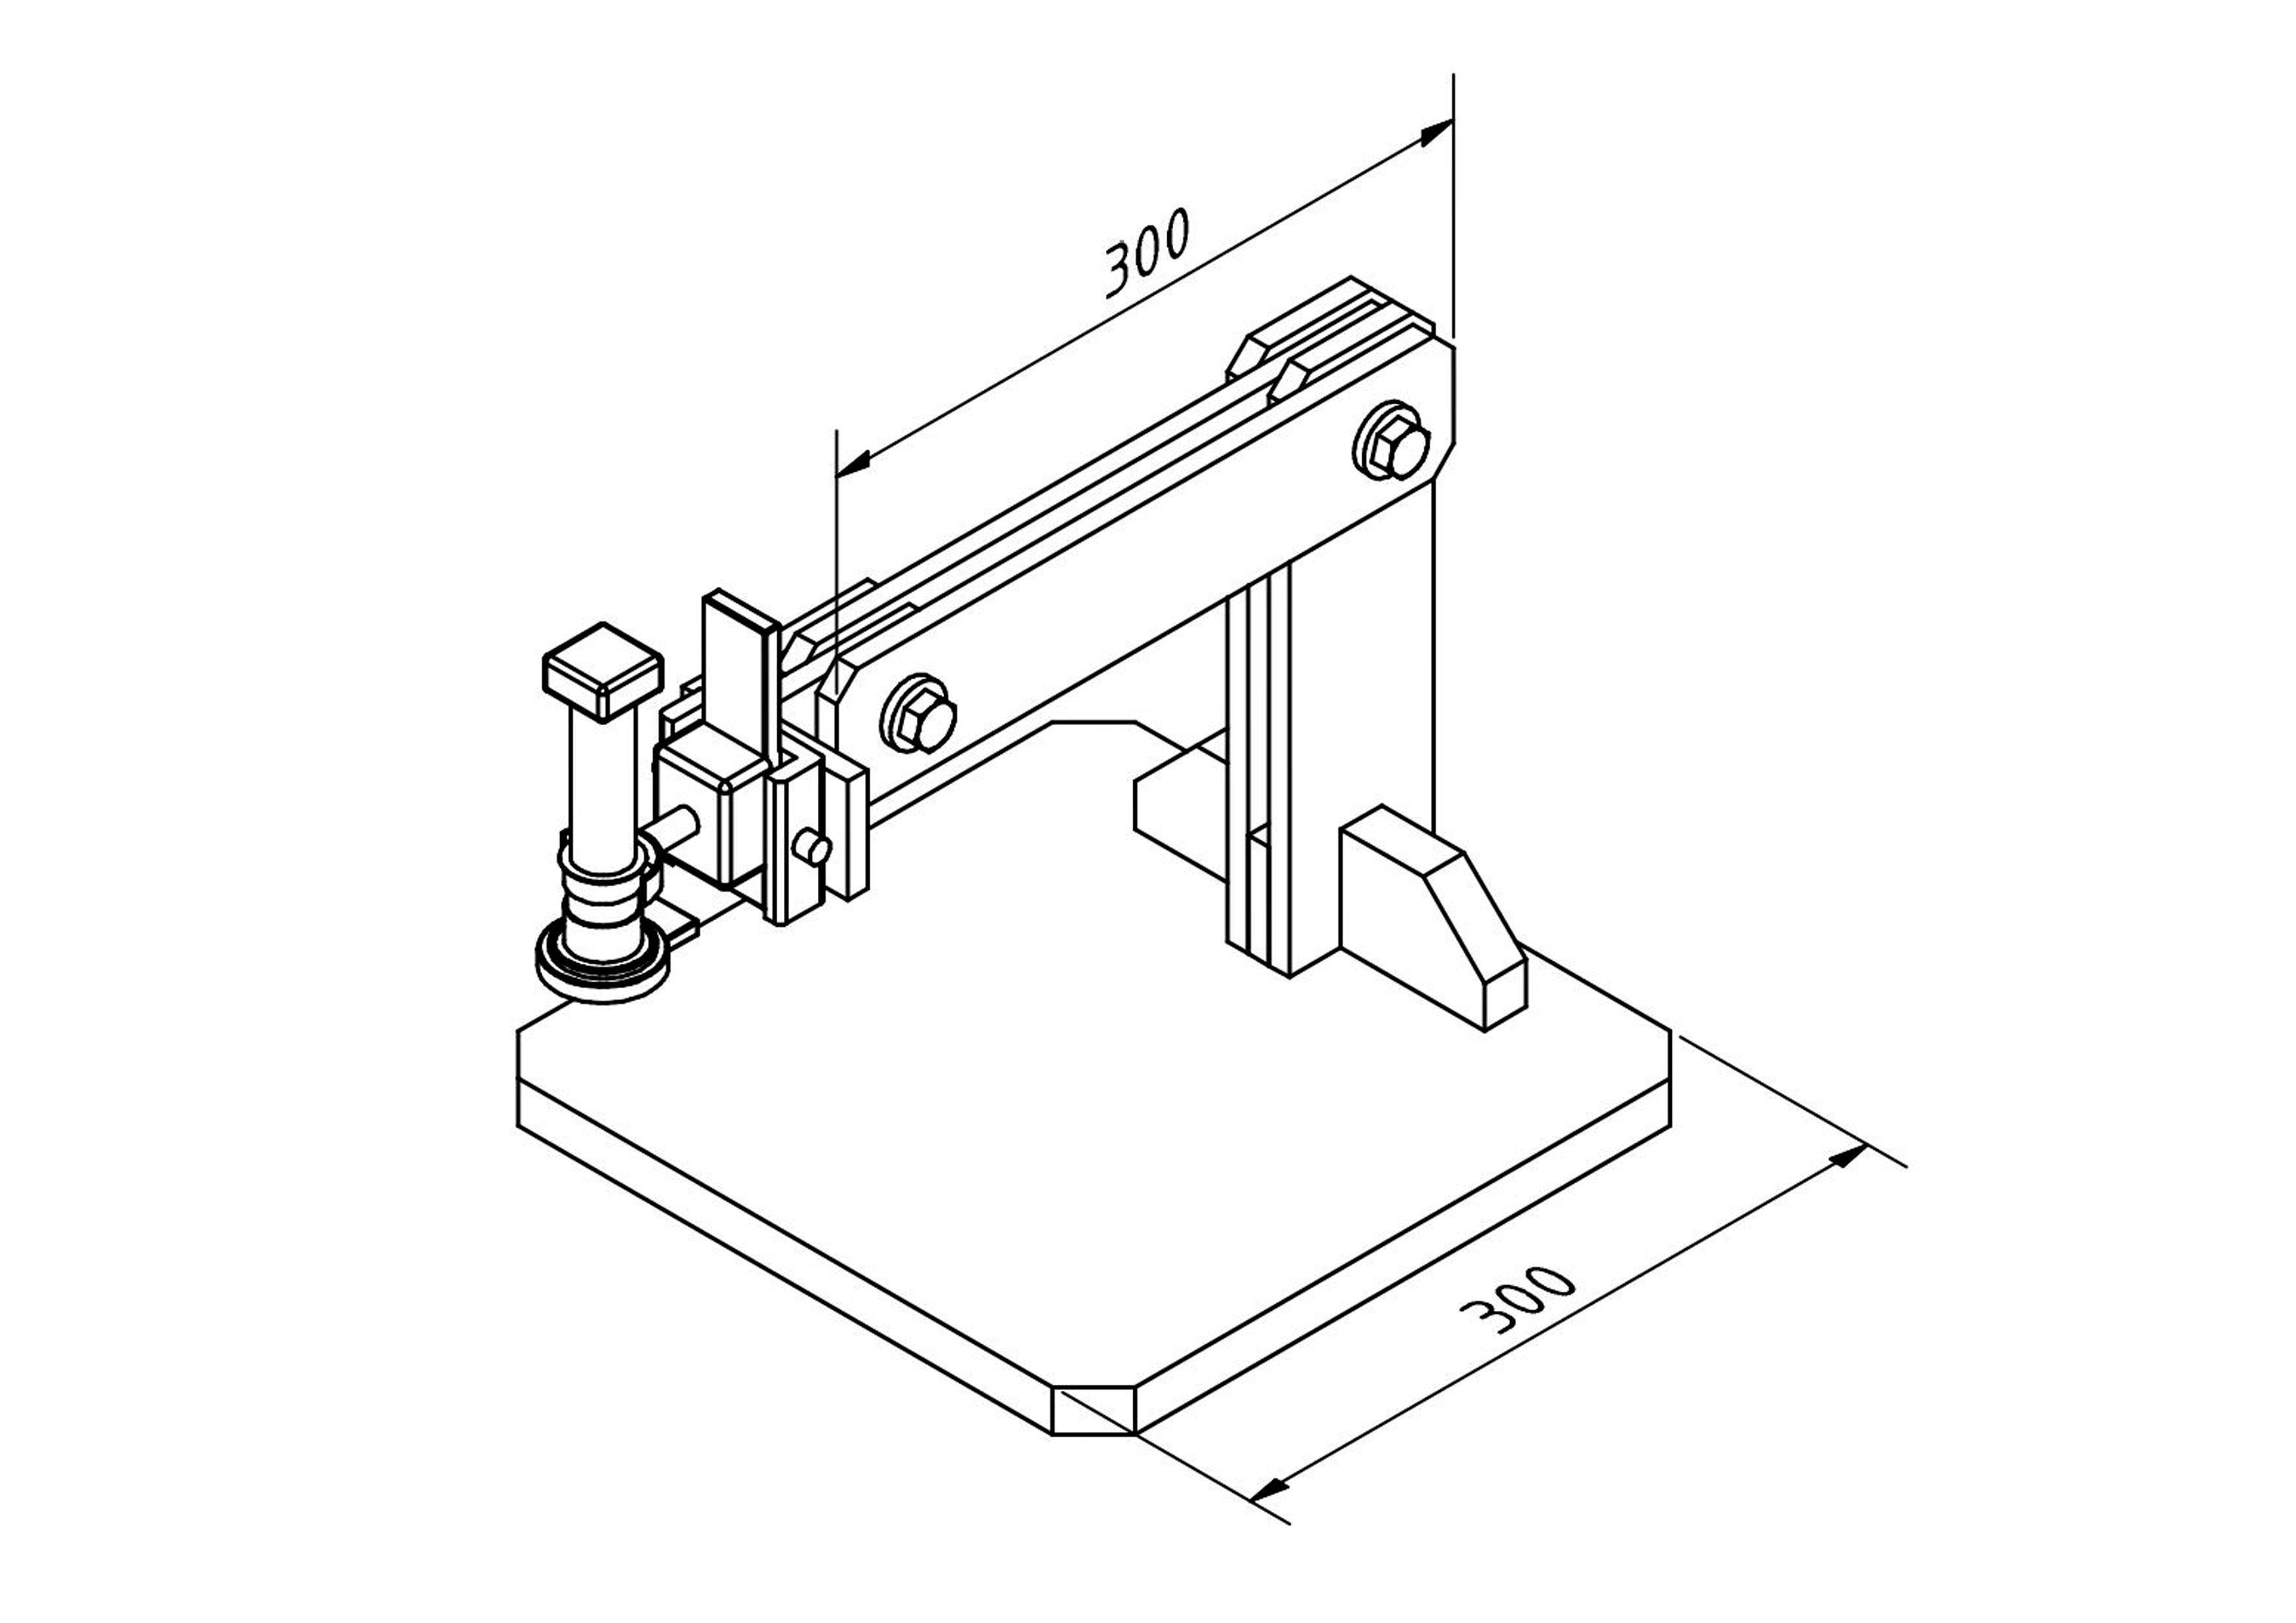 Dm imd inspection microscope diy pcb 0000.jpg